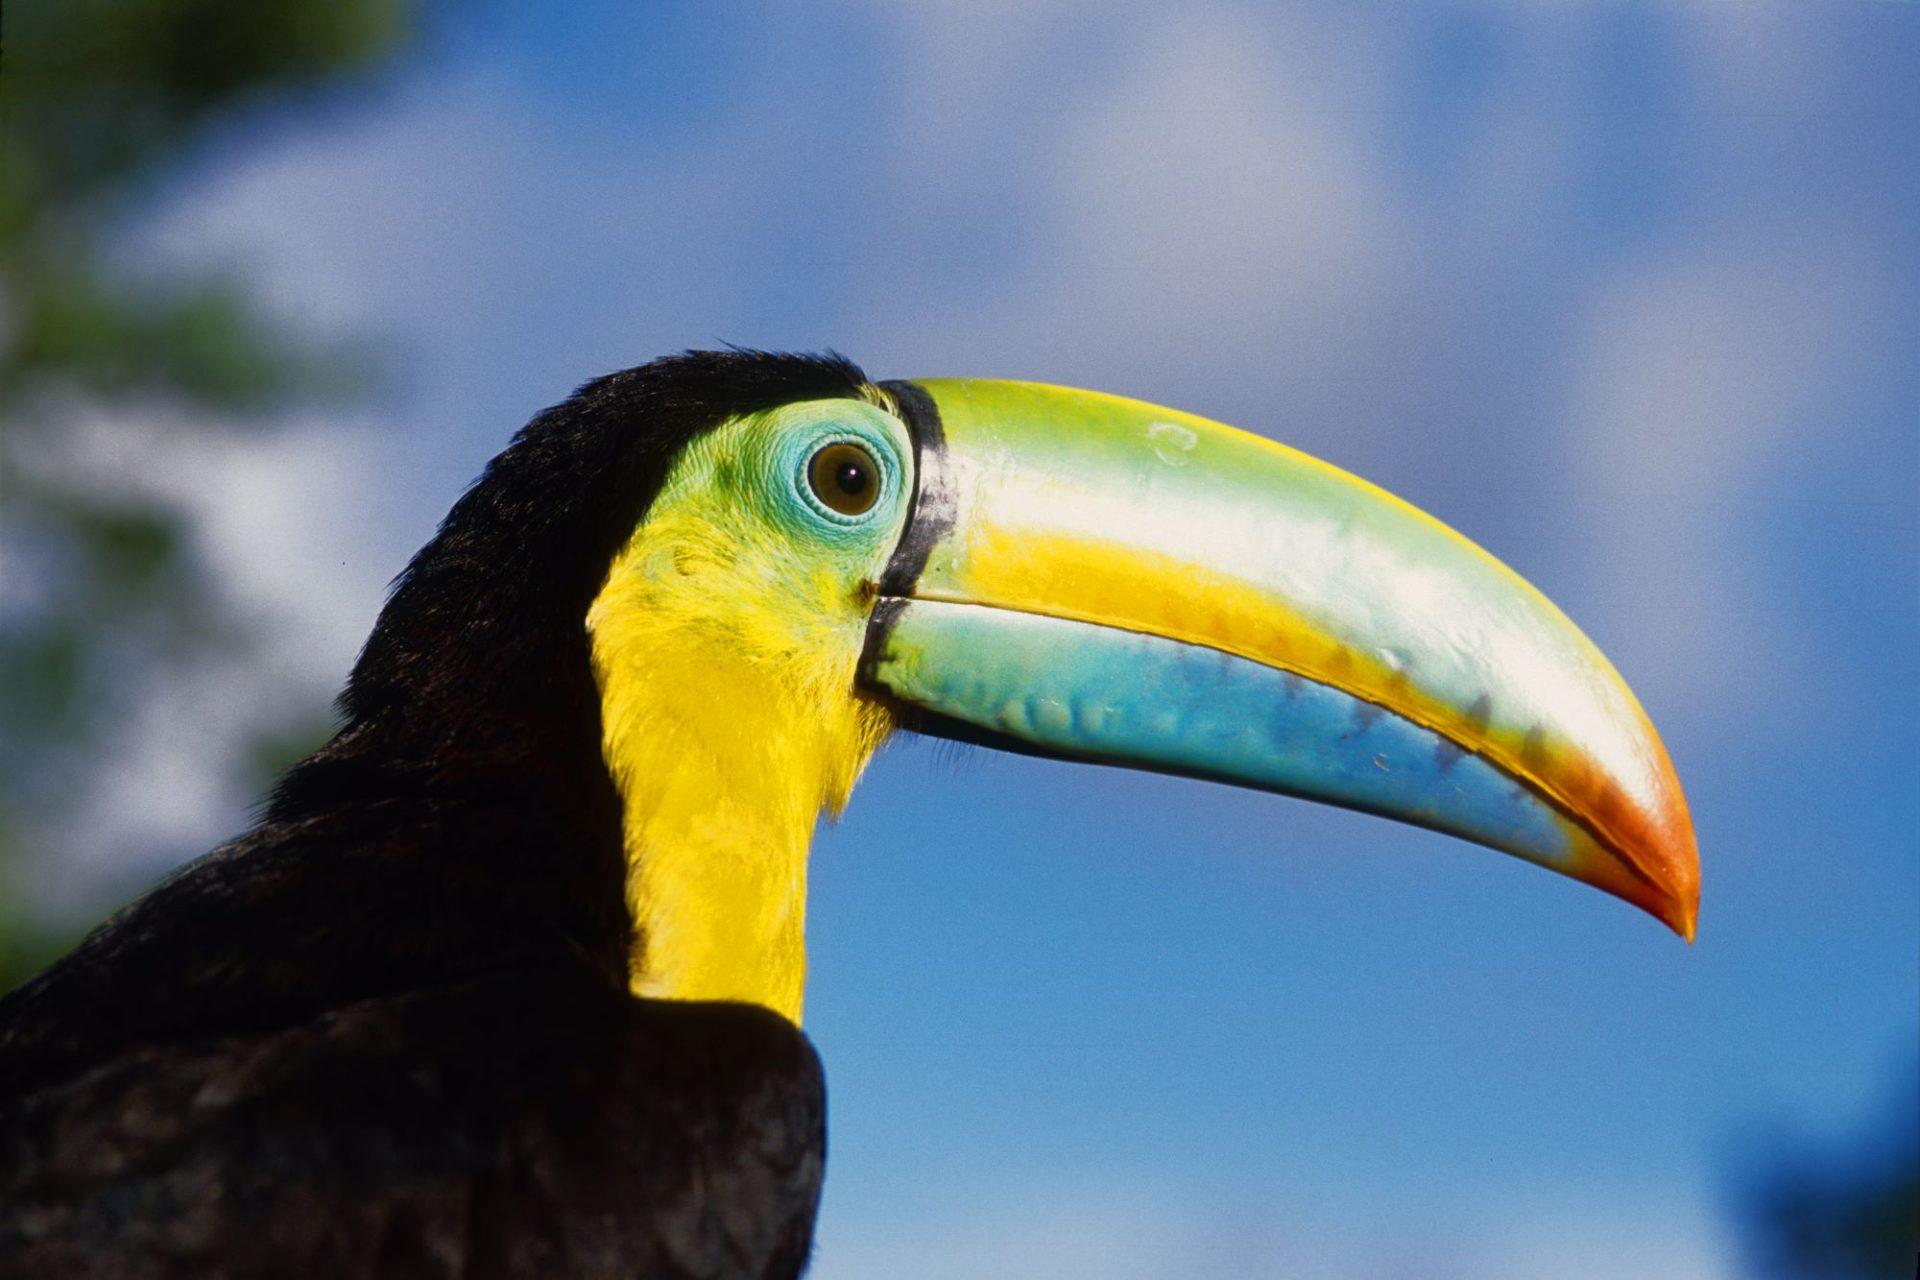 wp-content/uploads/itineraries/Costa-Rica/CRWildlifeDay9.jpg